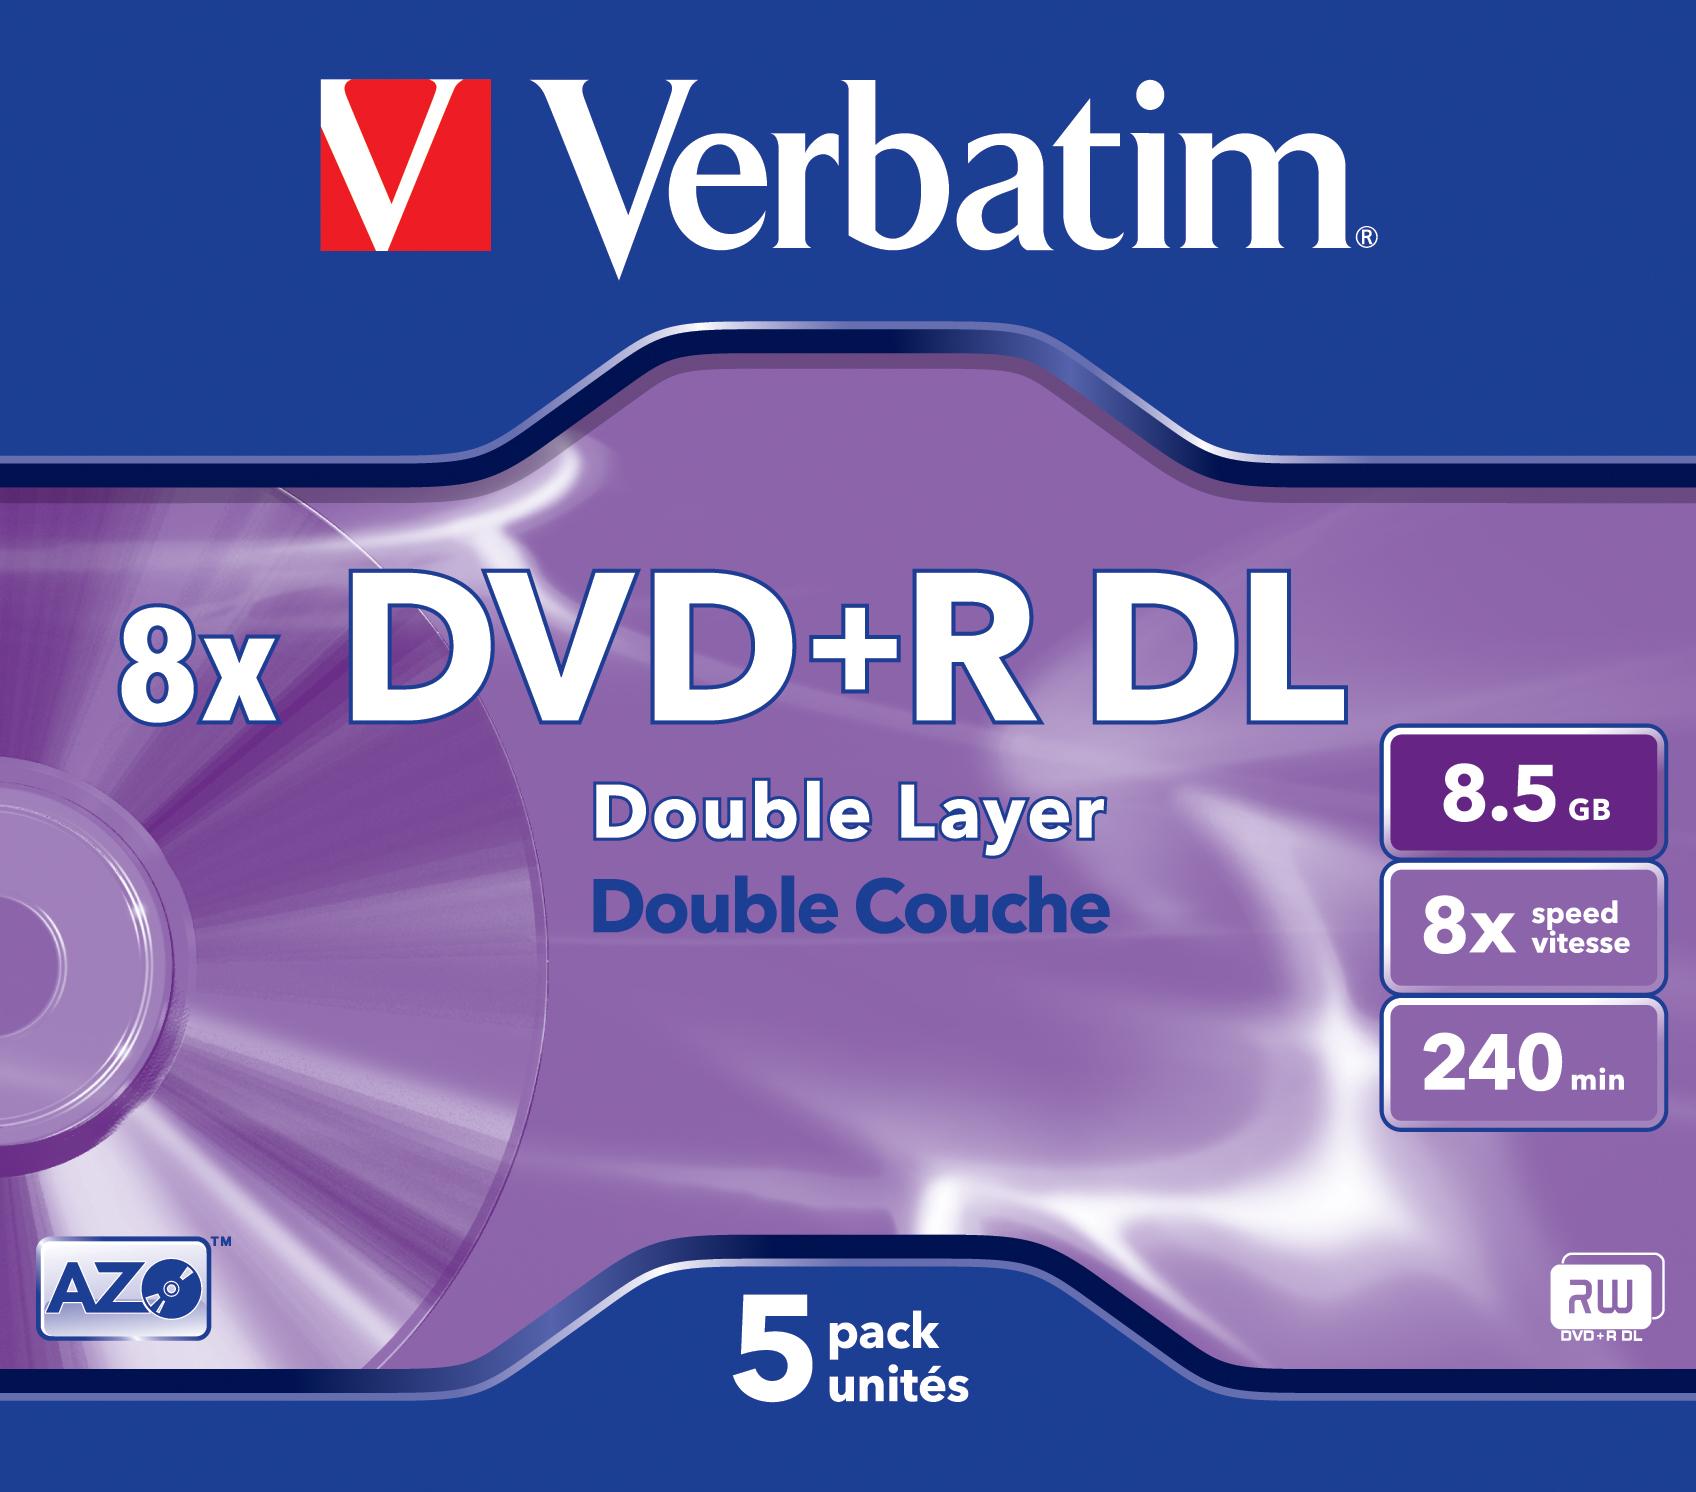 DVD+R DL 8,5 GB 8 speed, AdvAZO (5-pack jewelcase)